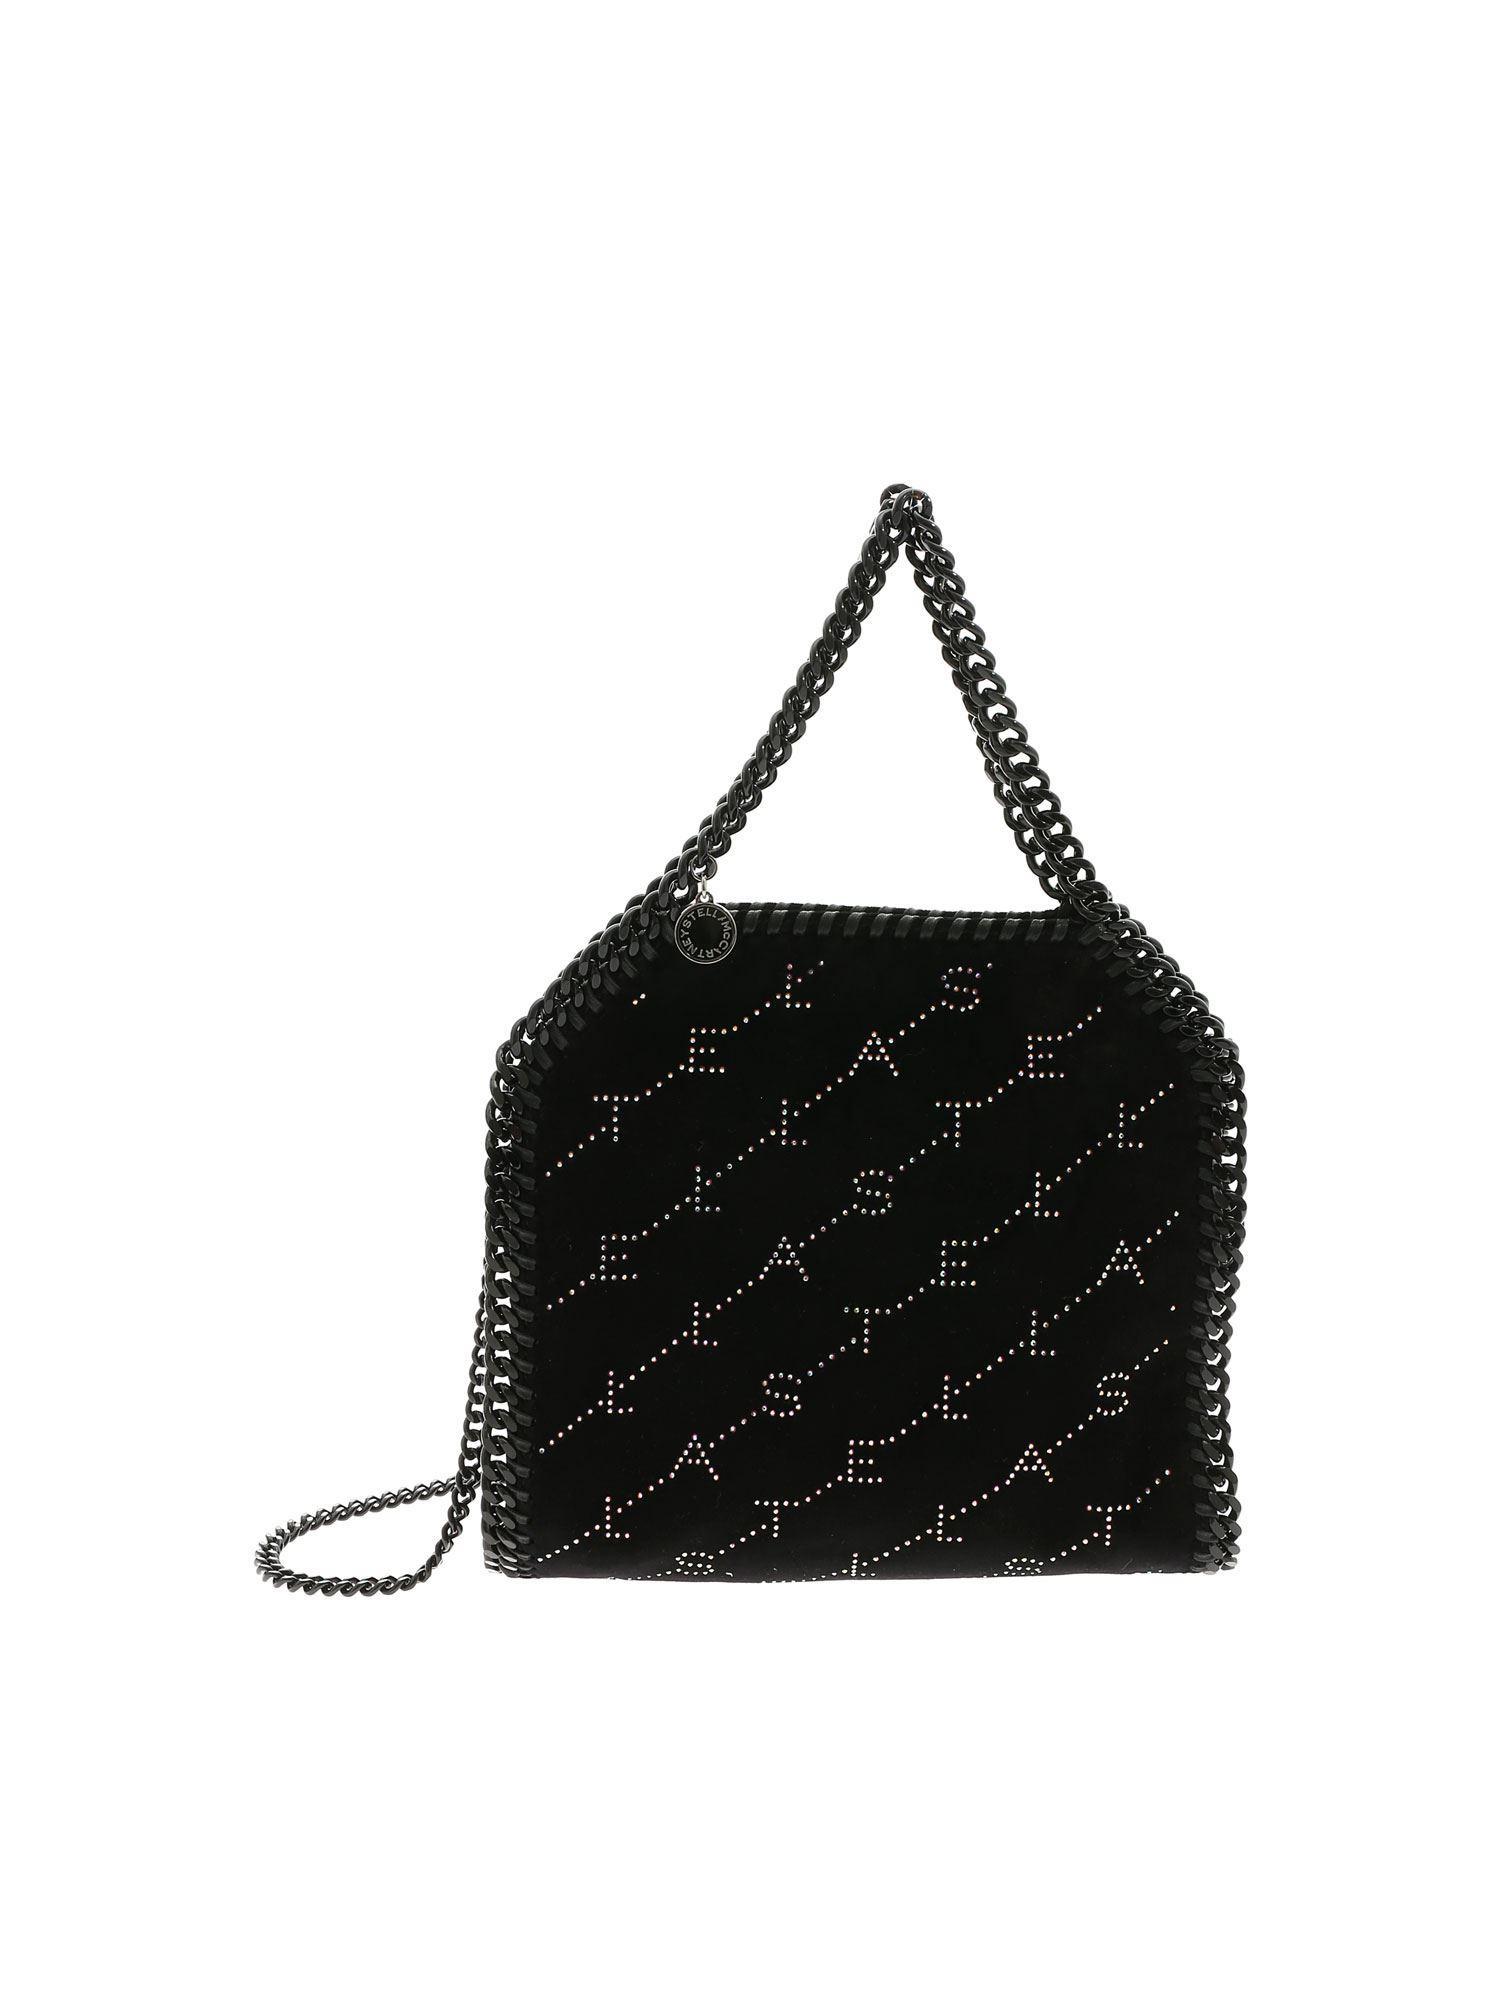 66df7b2a1478 Lyst - Stella Mccartney Falabella Mini Bag With Black Velvet Effect ...